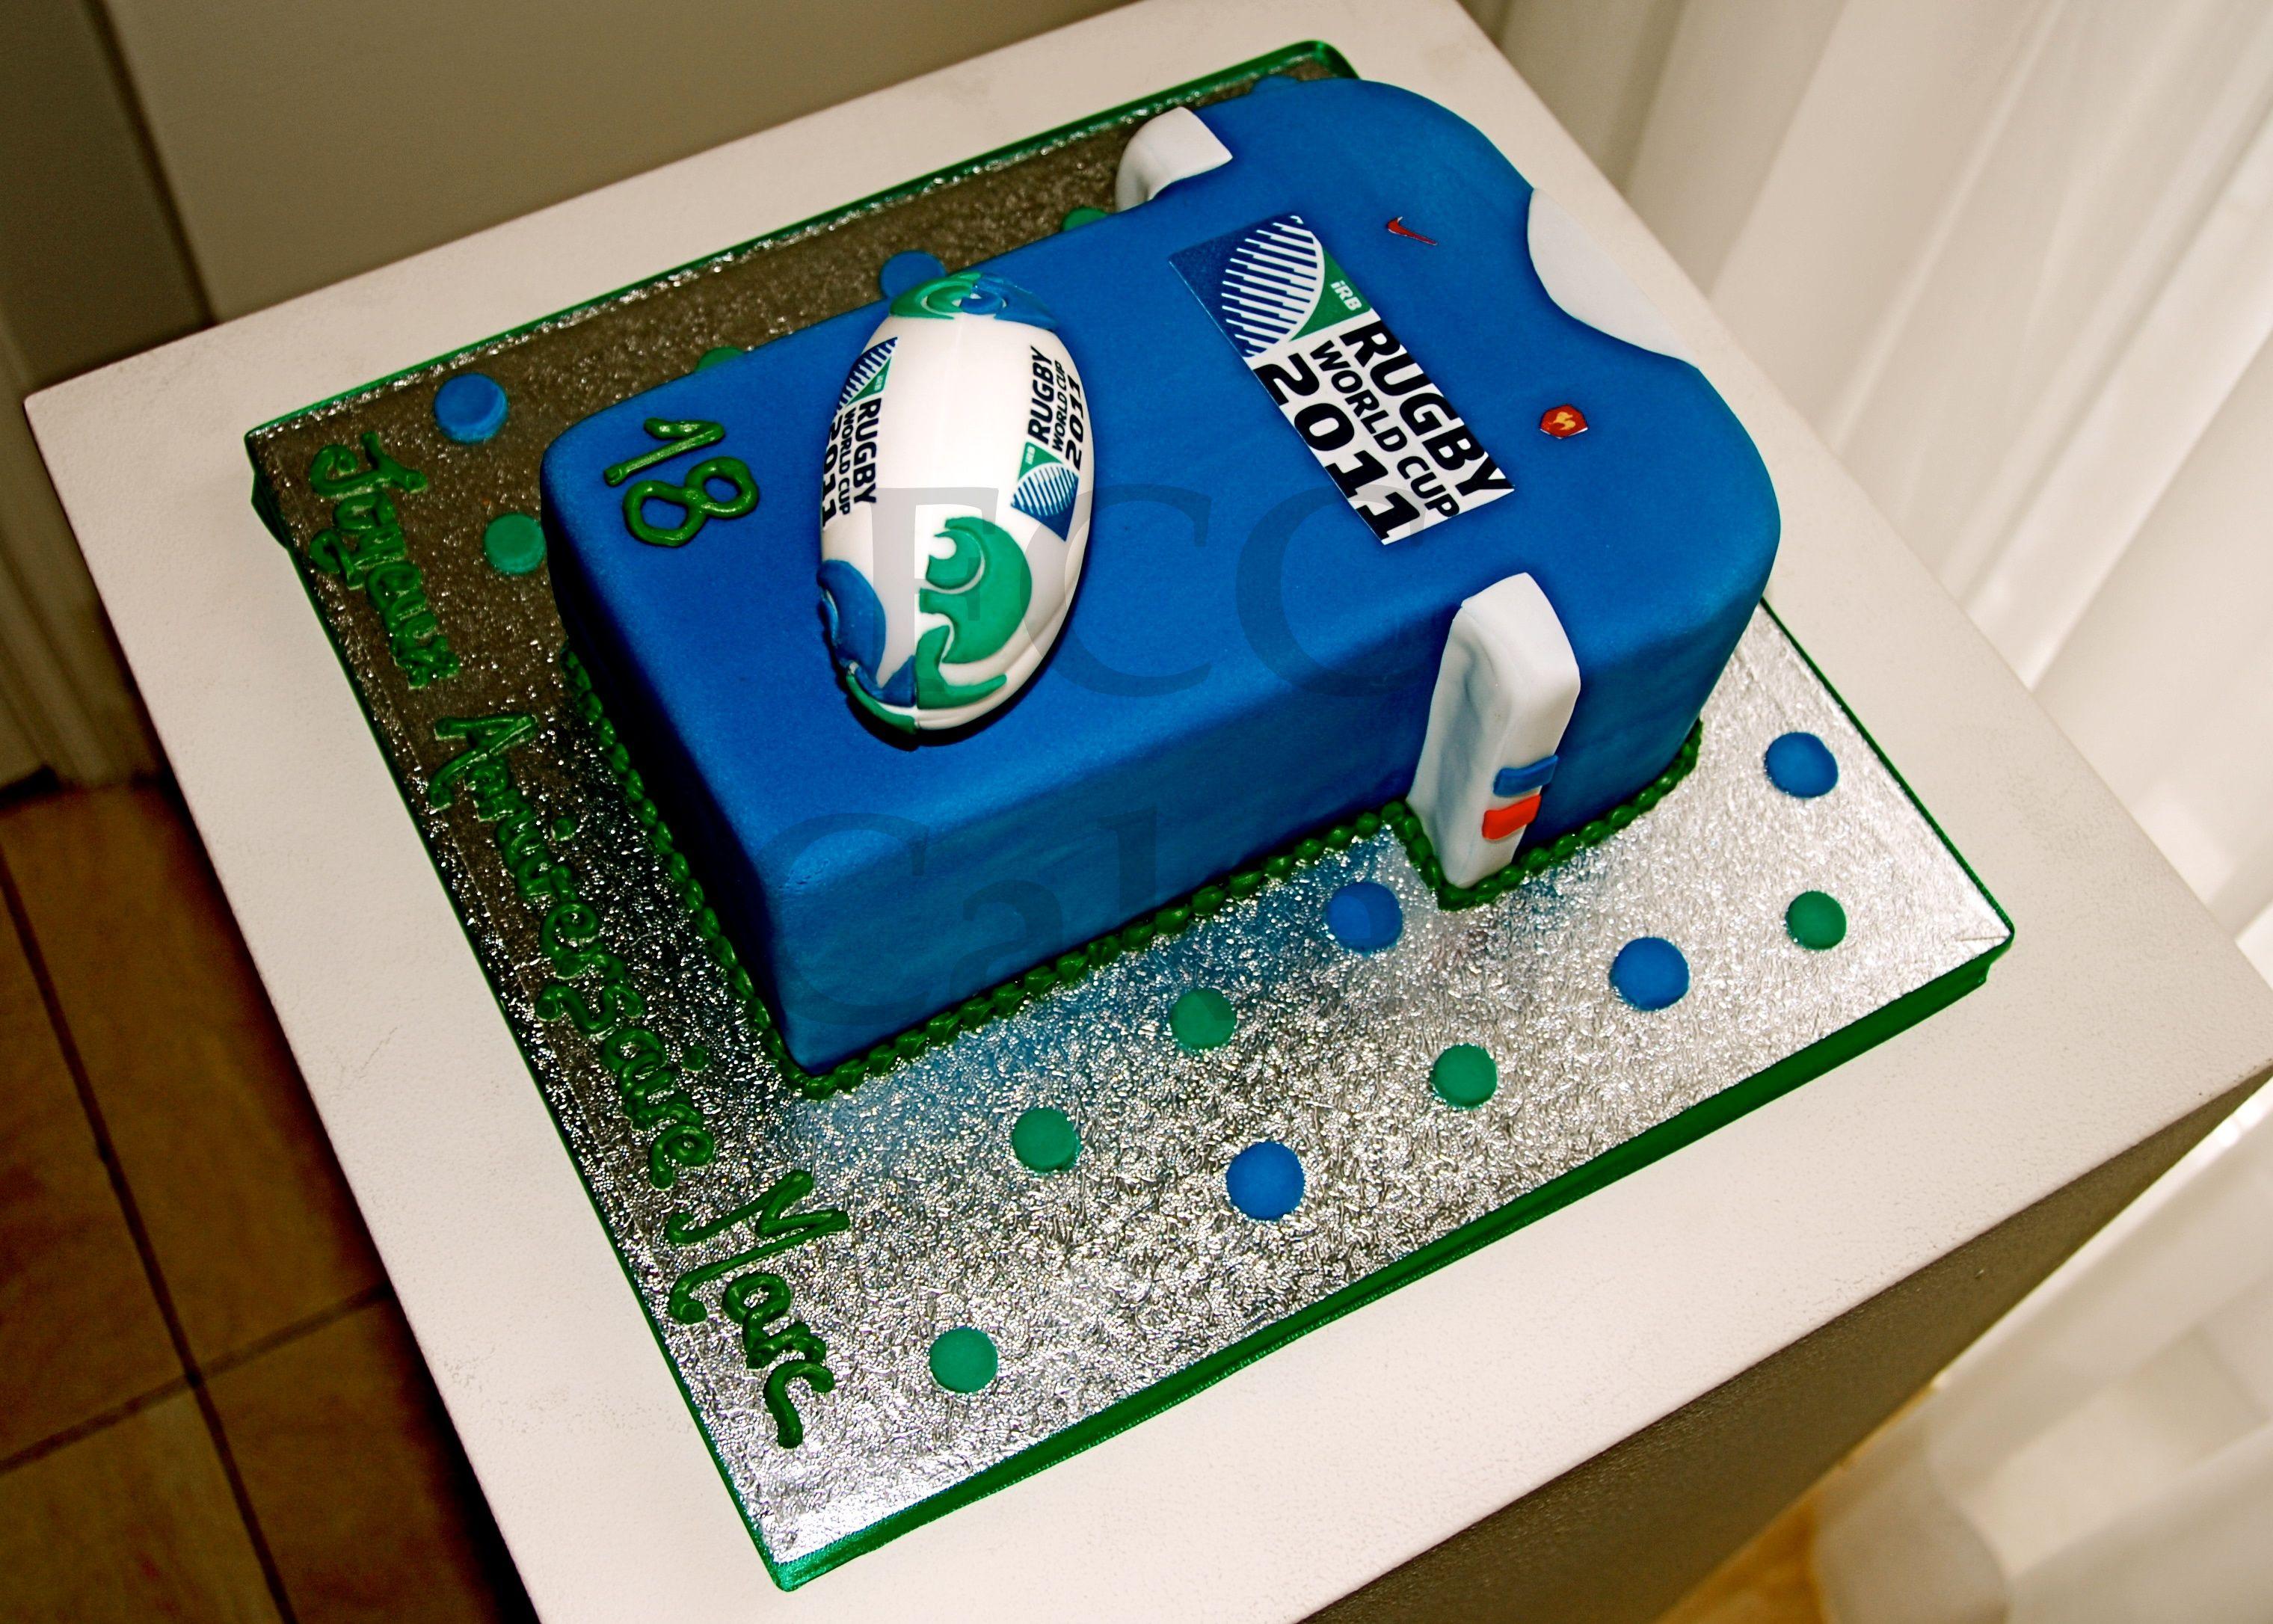 sporty cake rugby gateau d 39 anniversaire sport rugby verjaardagstaart sport rugby anniv gia. Black Bedroom Furniture Sets. Home Design Ideas